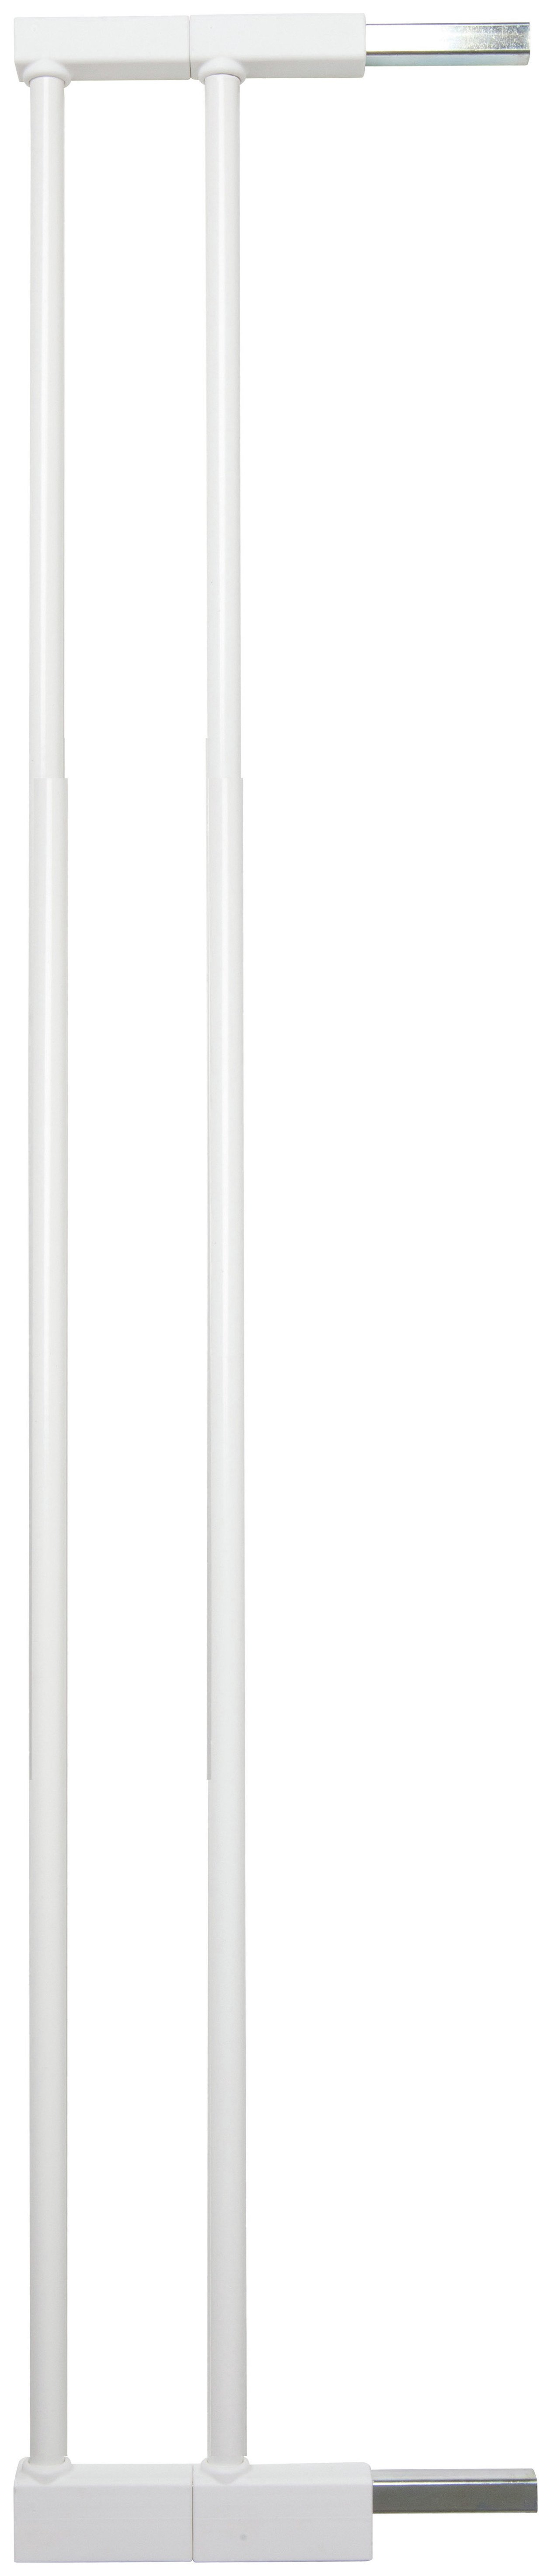 Scandinavian - Pet Design Tall Safety Gate - White.